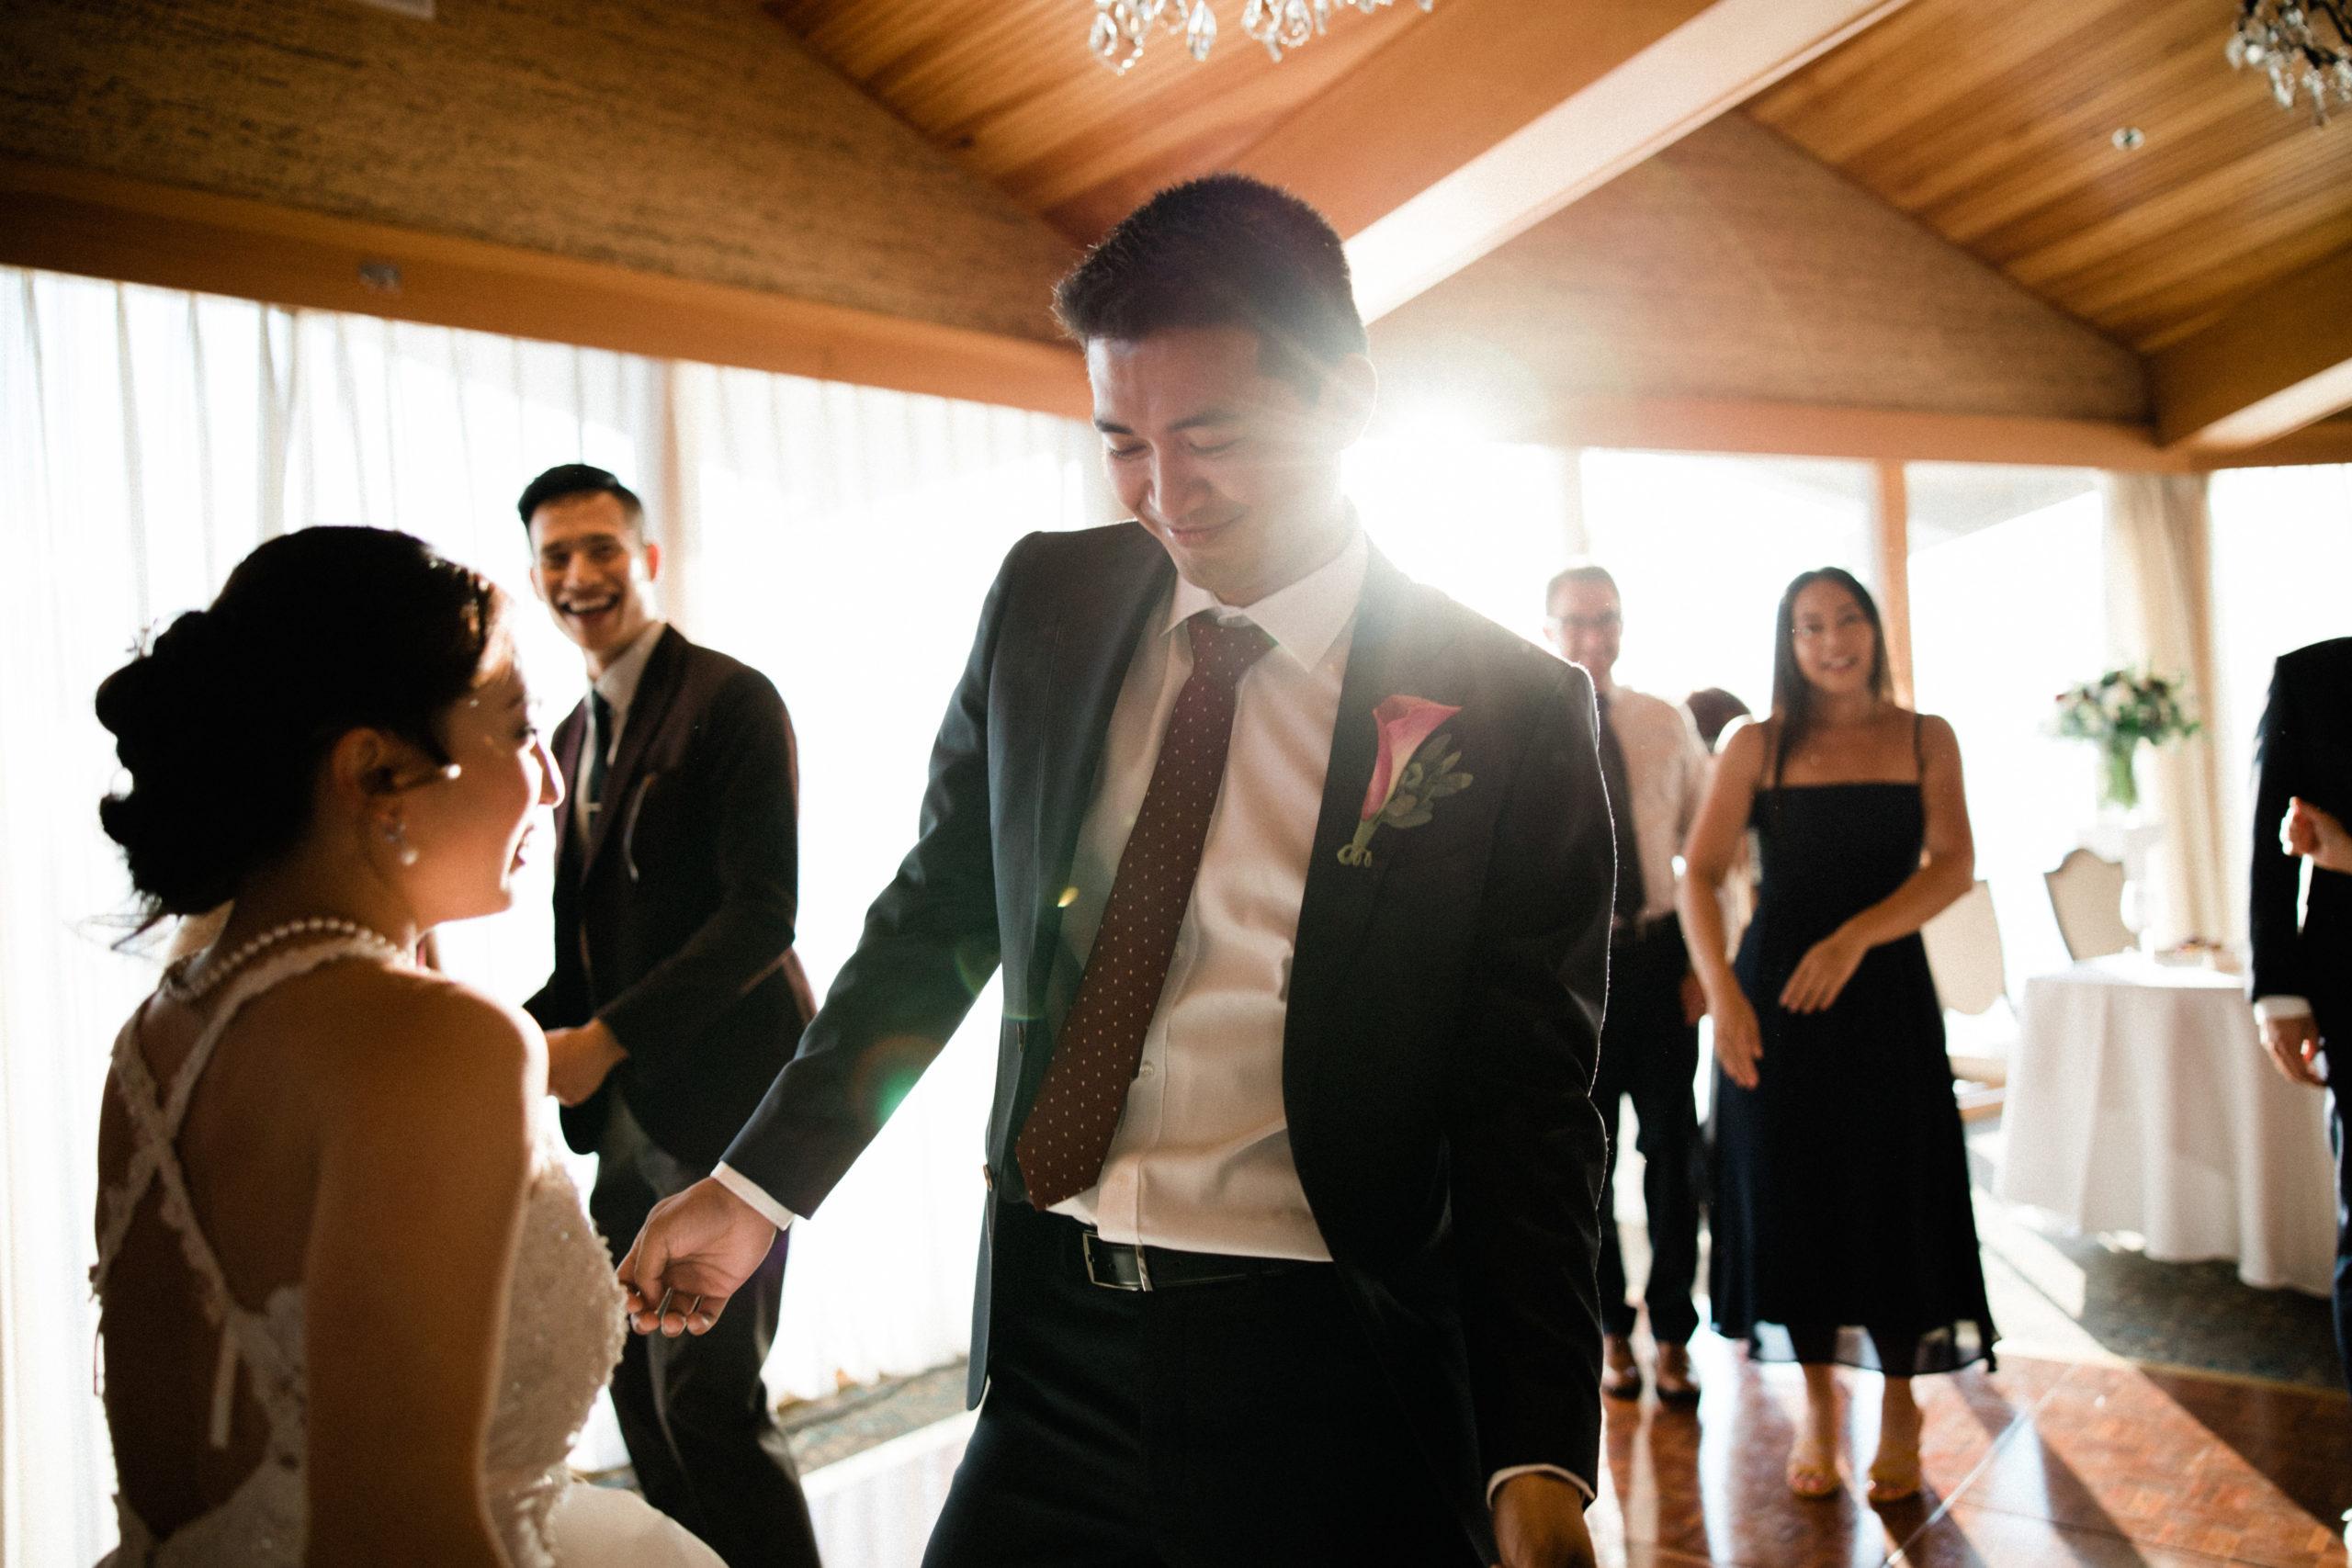 groom dances on the ballroom wood floor with guests cheering